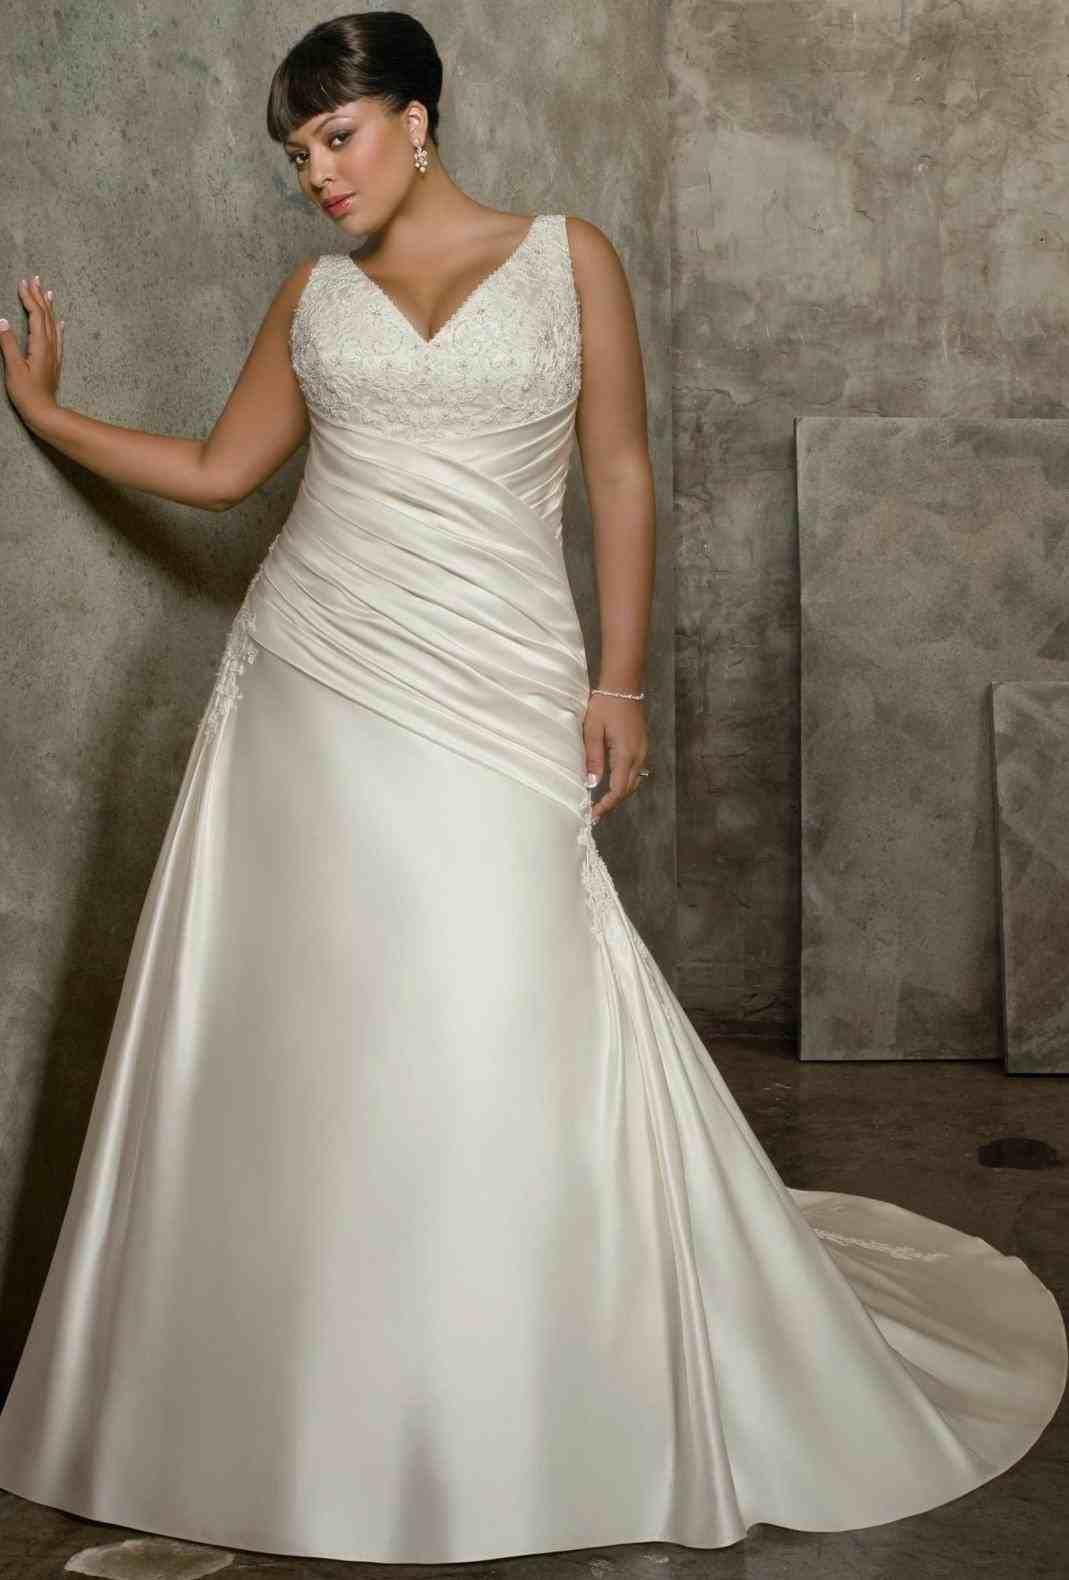 plus size western wedding dresses | Plus Size Wedding ...